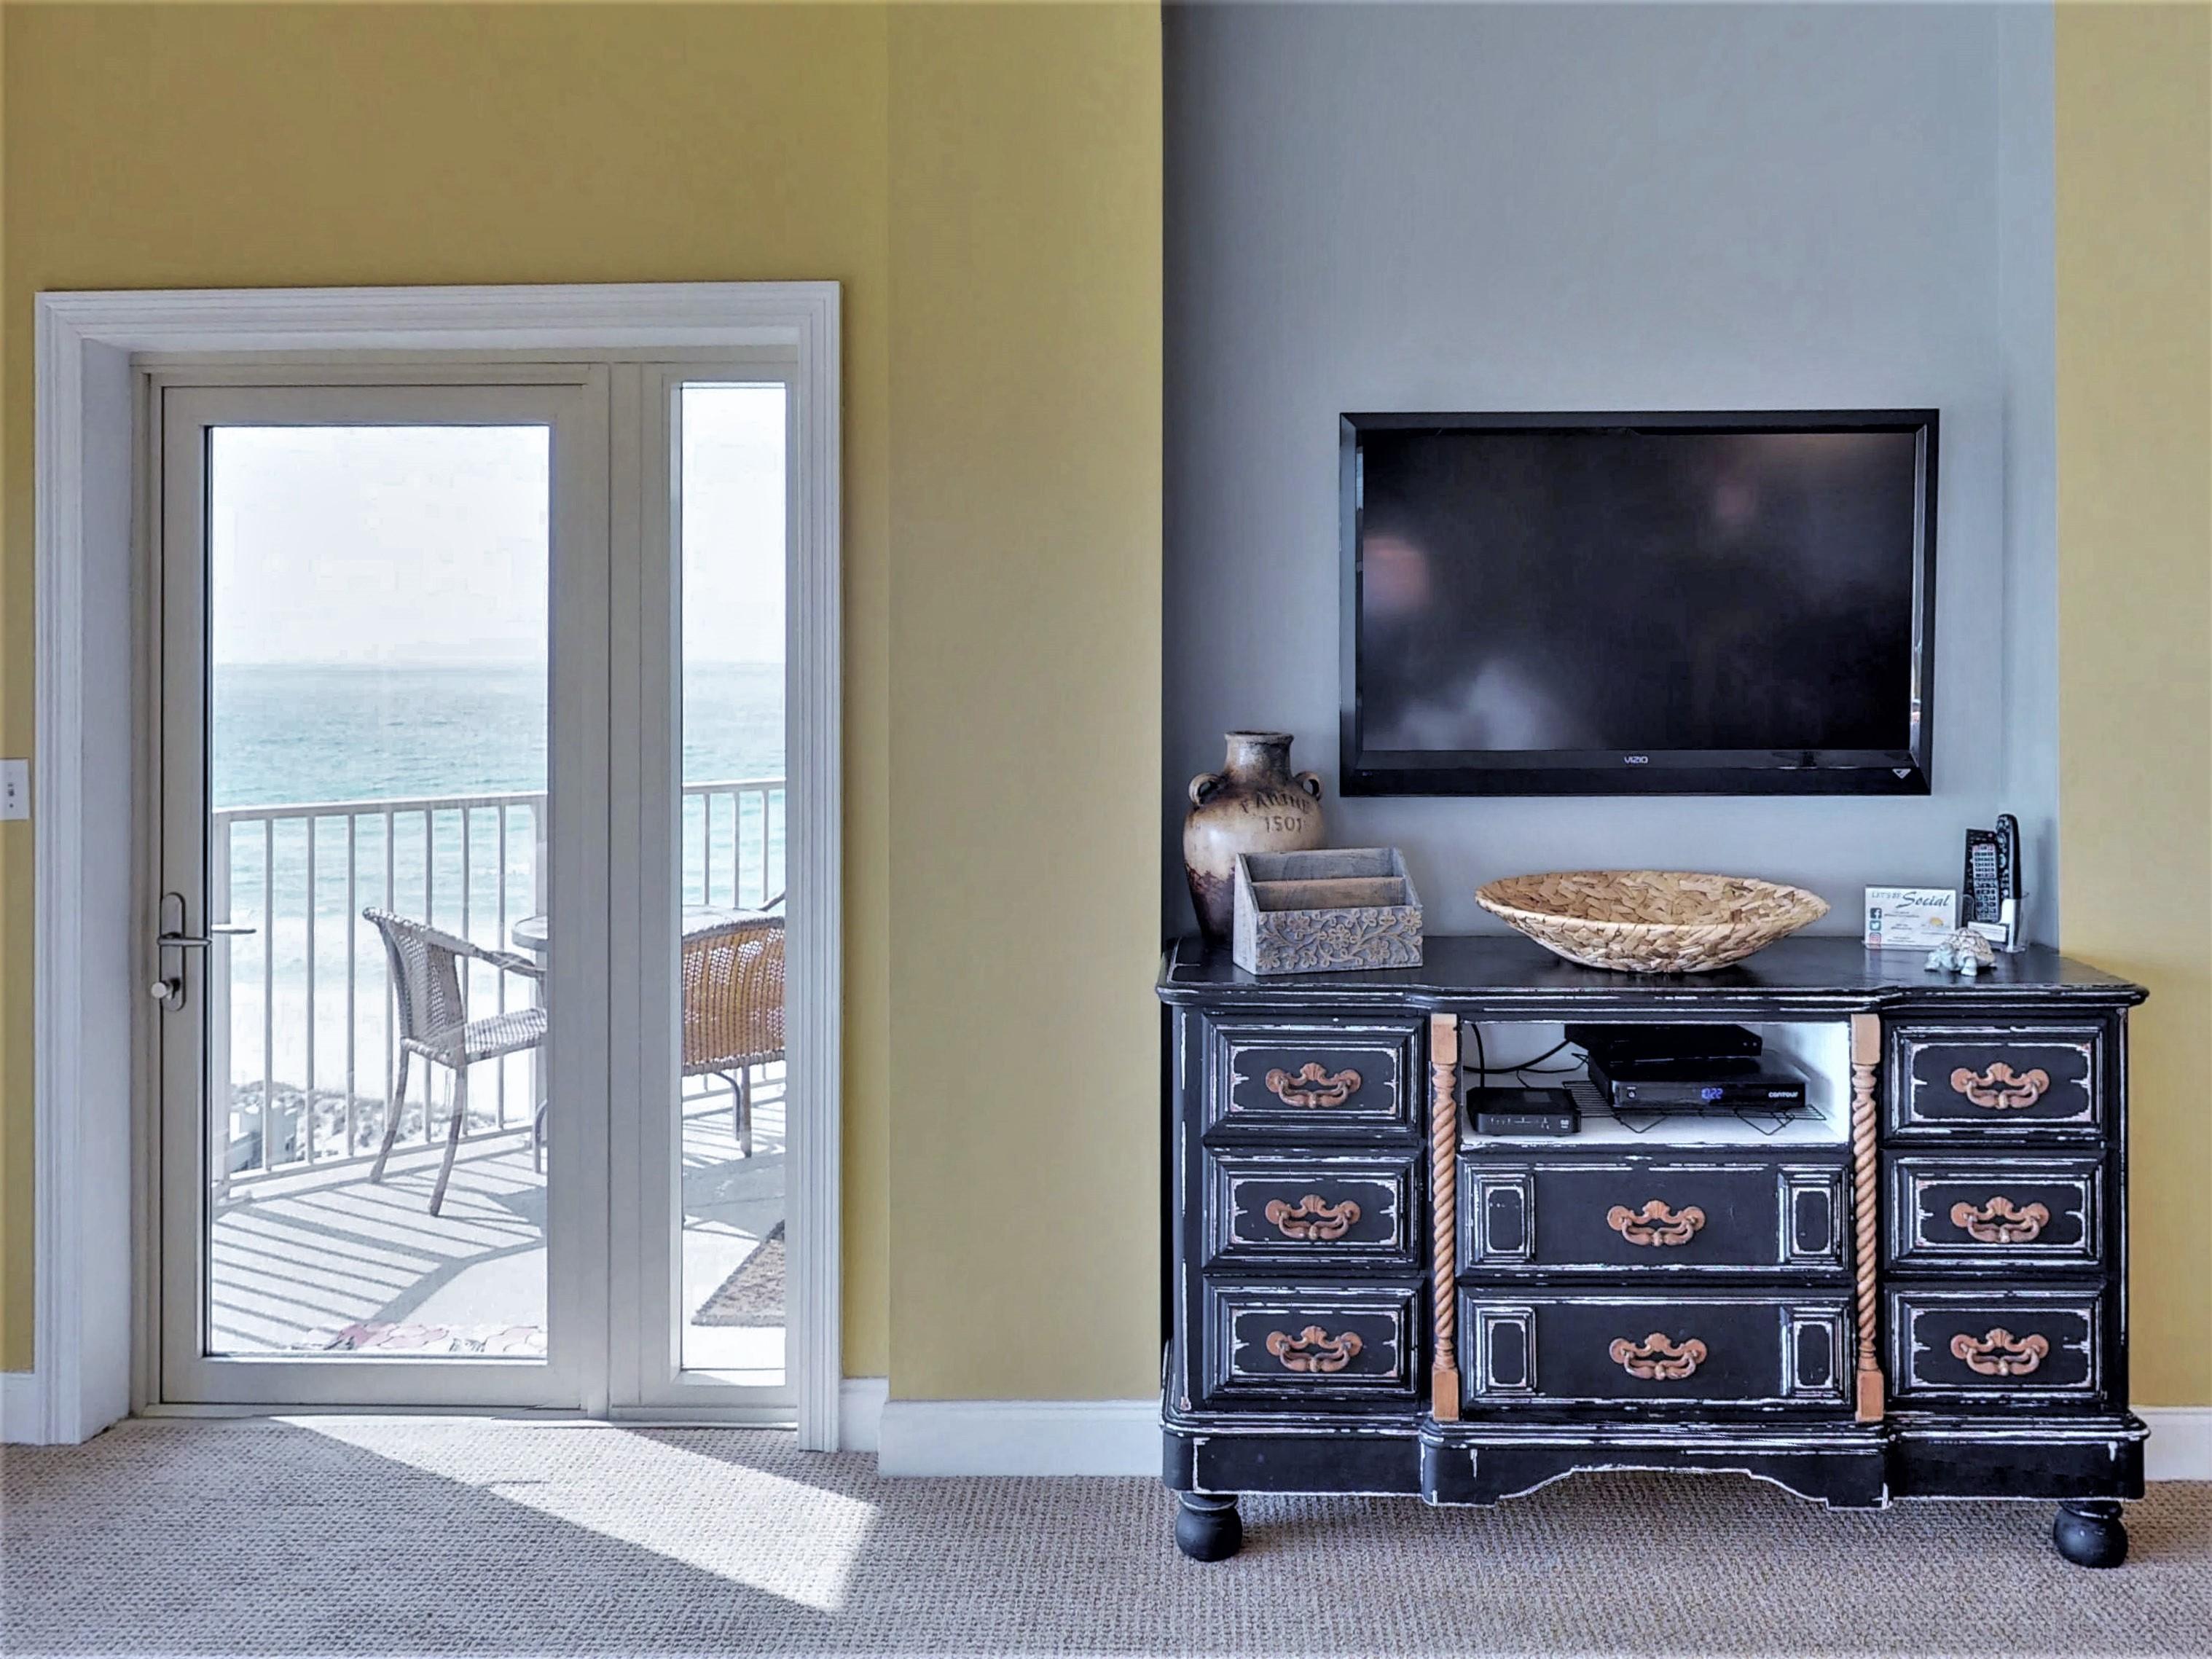 905 Tops'l Beach Manor Condo rental in TOPS'L Beach Manor  in Destin Florida - #5